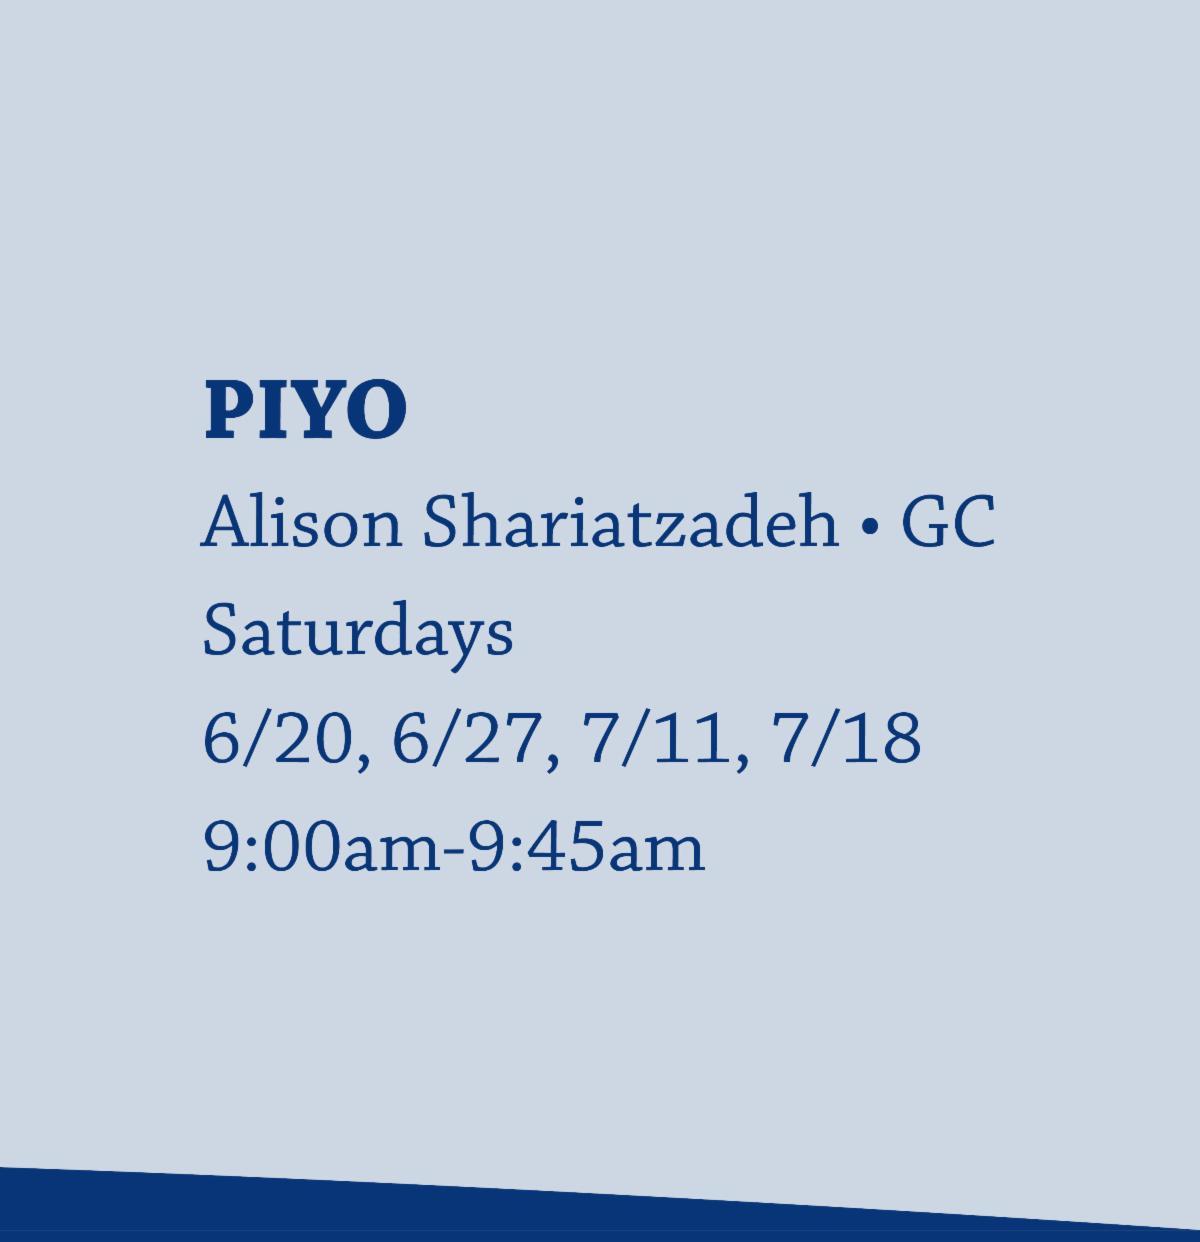 PiYo with Alison Shariatzadeh on Saturdays from 9:00am-9:45am